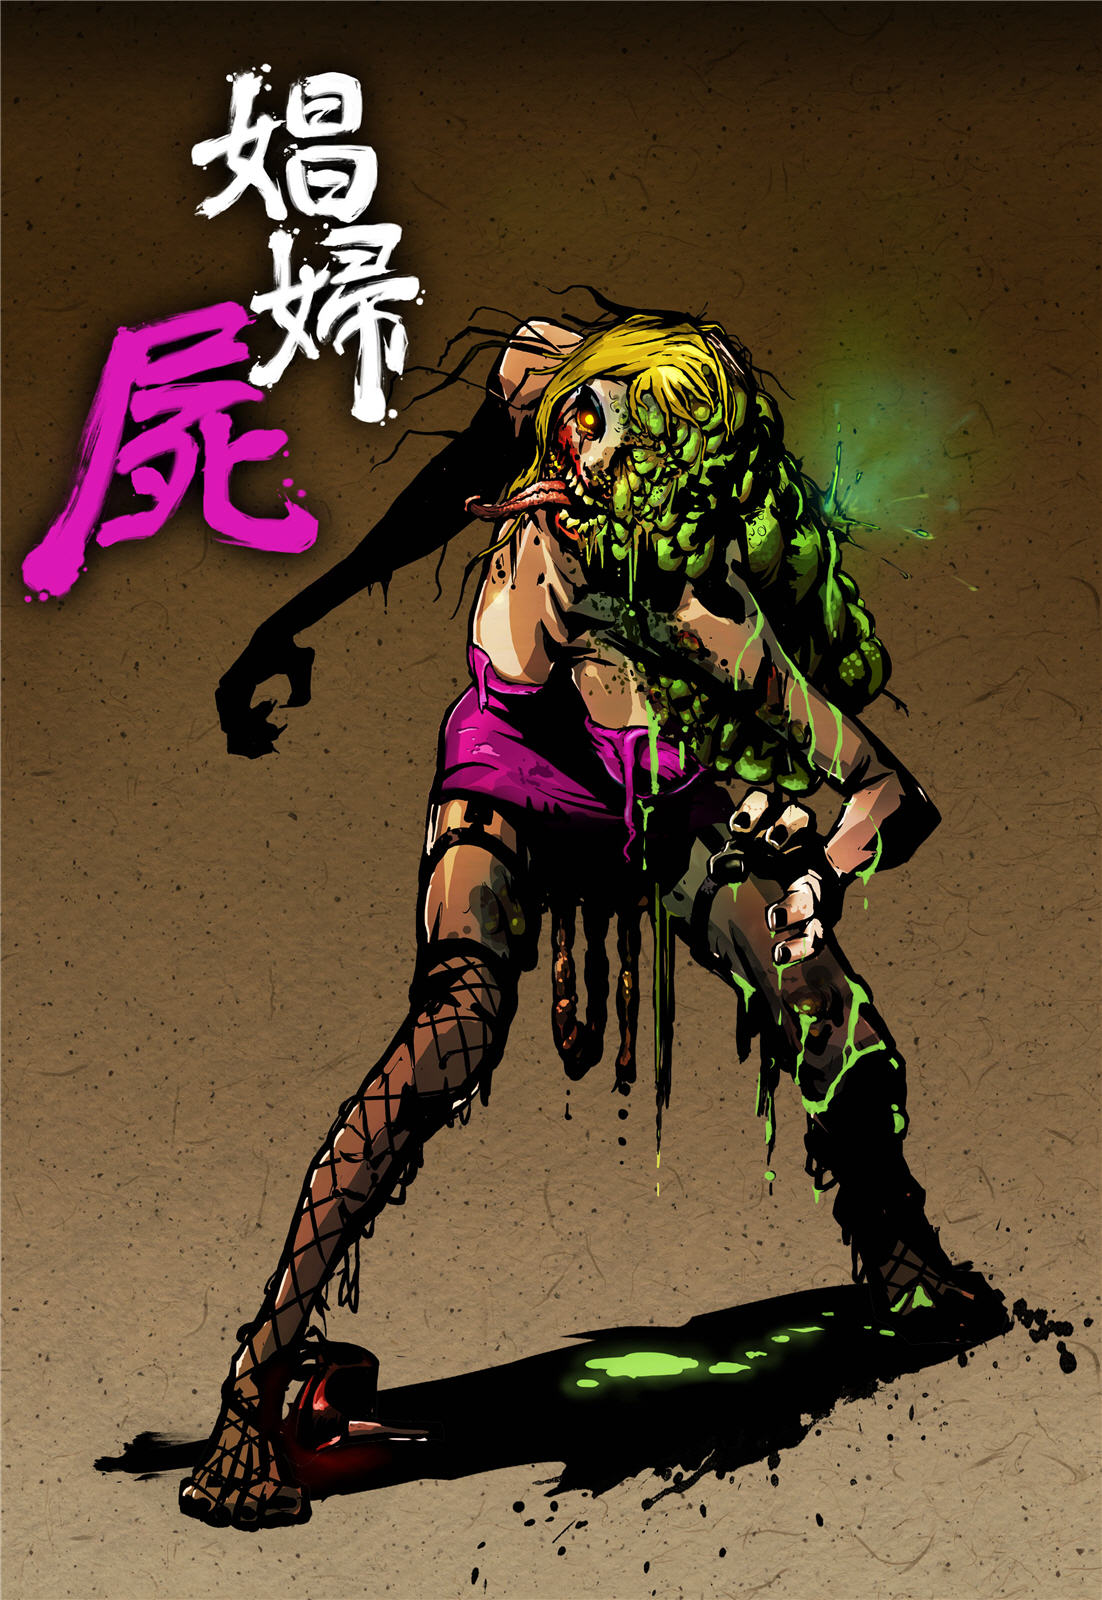 yaiba ninja gaiden z meets the blister sister